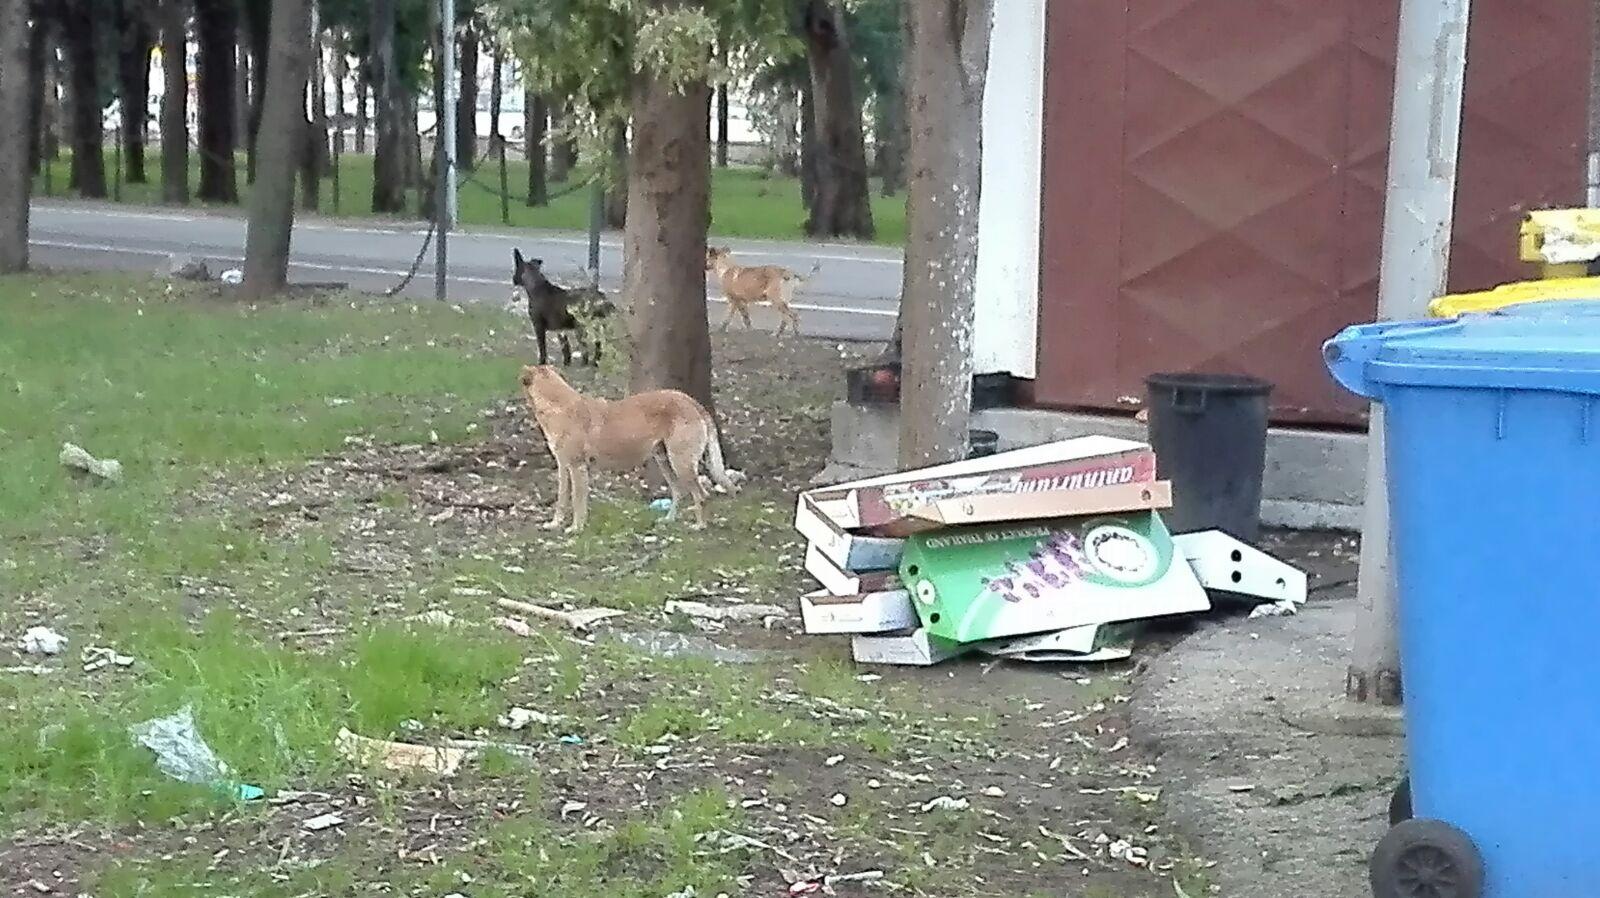 UFFICIO RECLAMI, cani randagi spaventano i cittadini